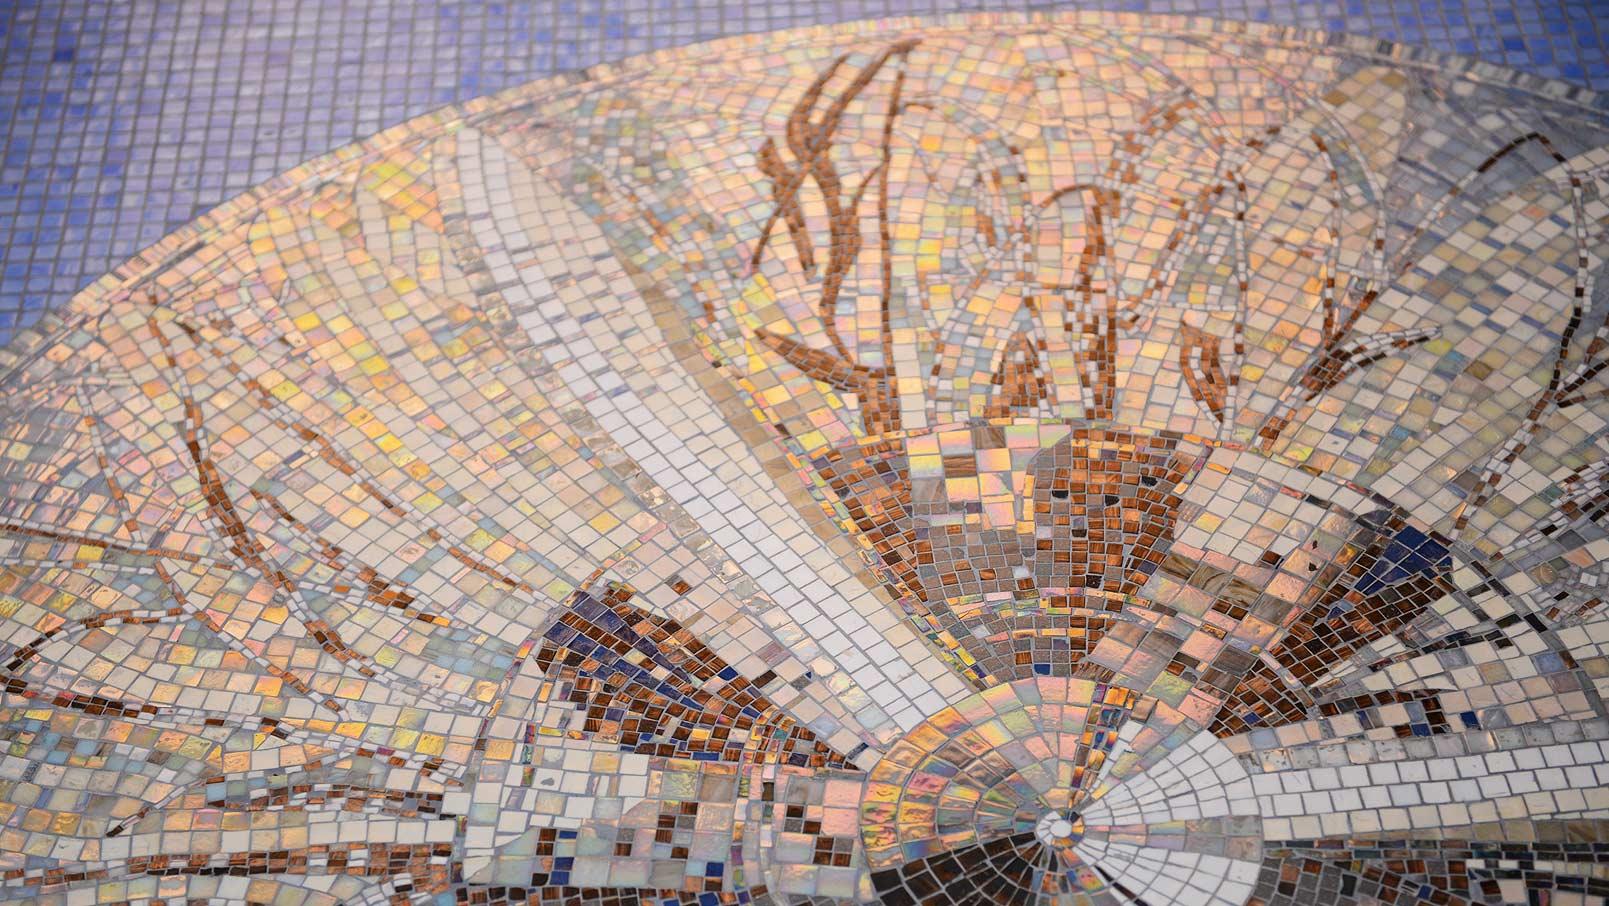 Схема мозаичного панно